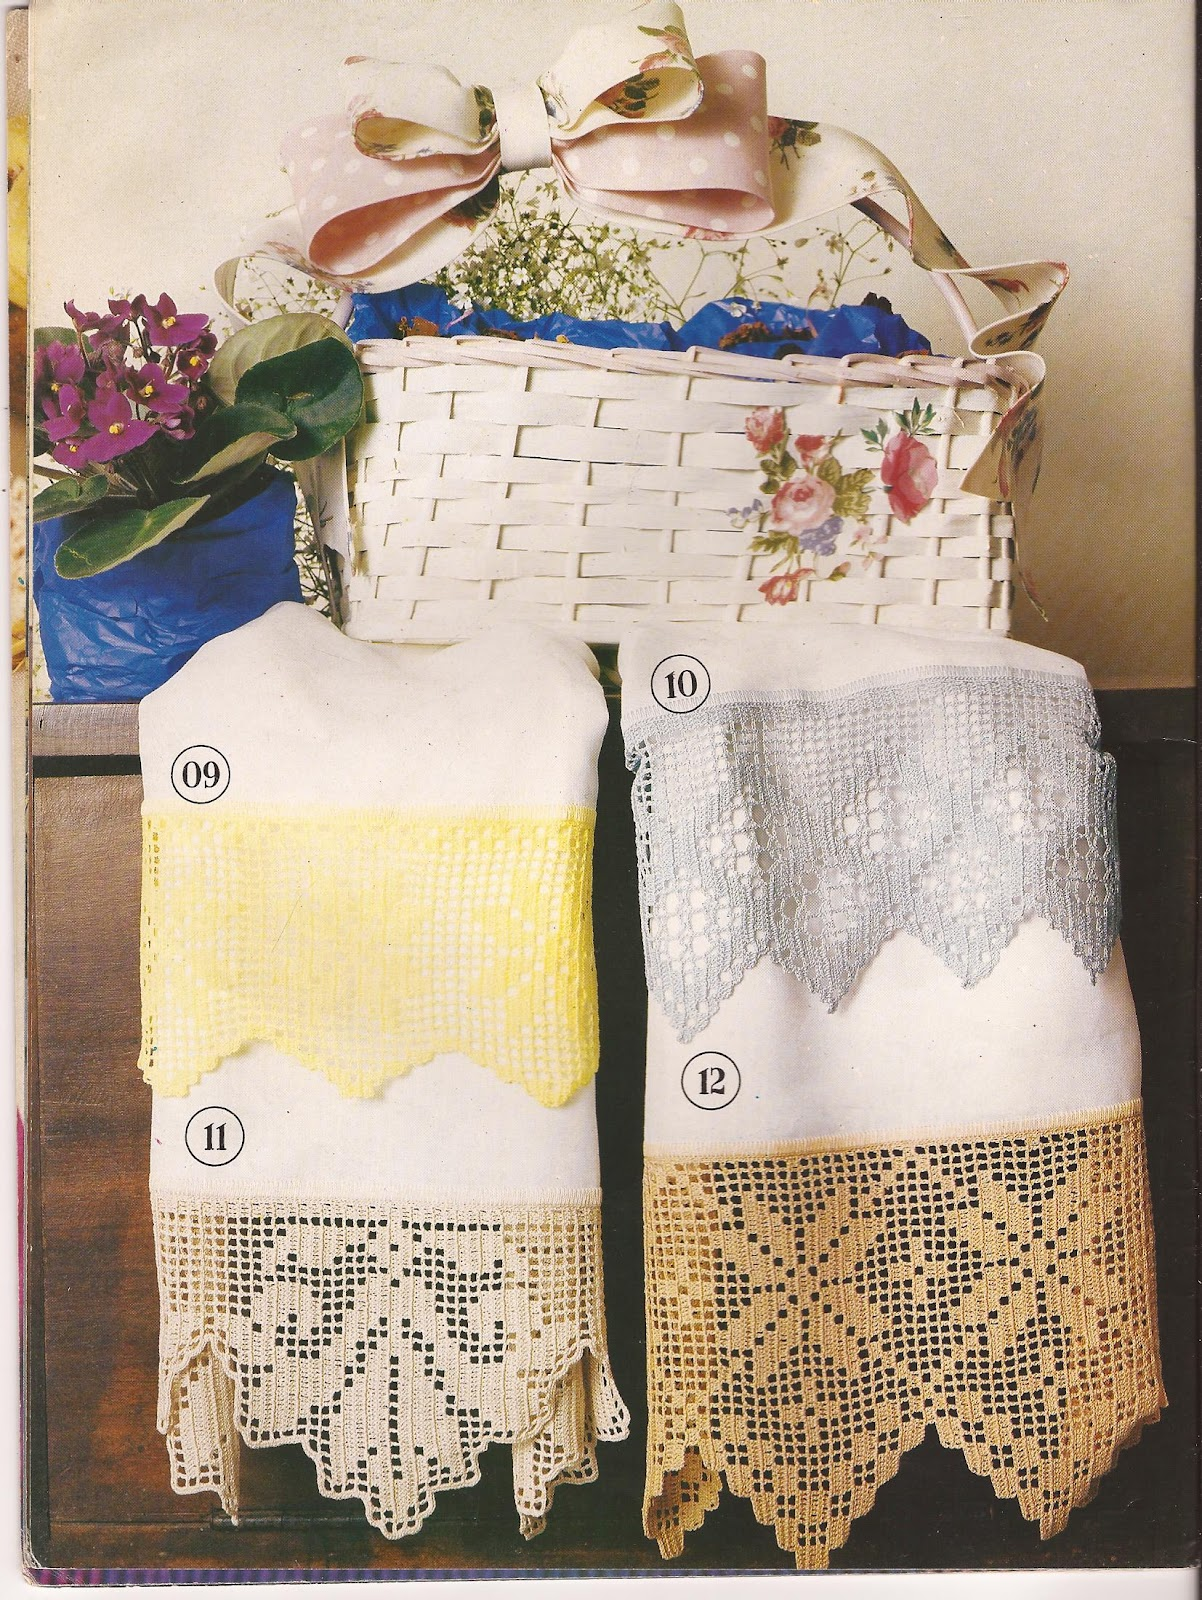 bicos+de+croche+para+toalhas+de+lavabo.jpg